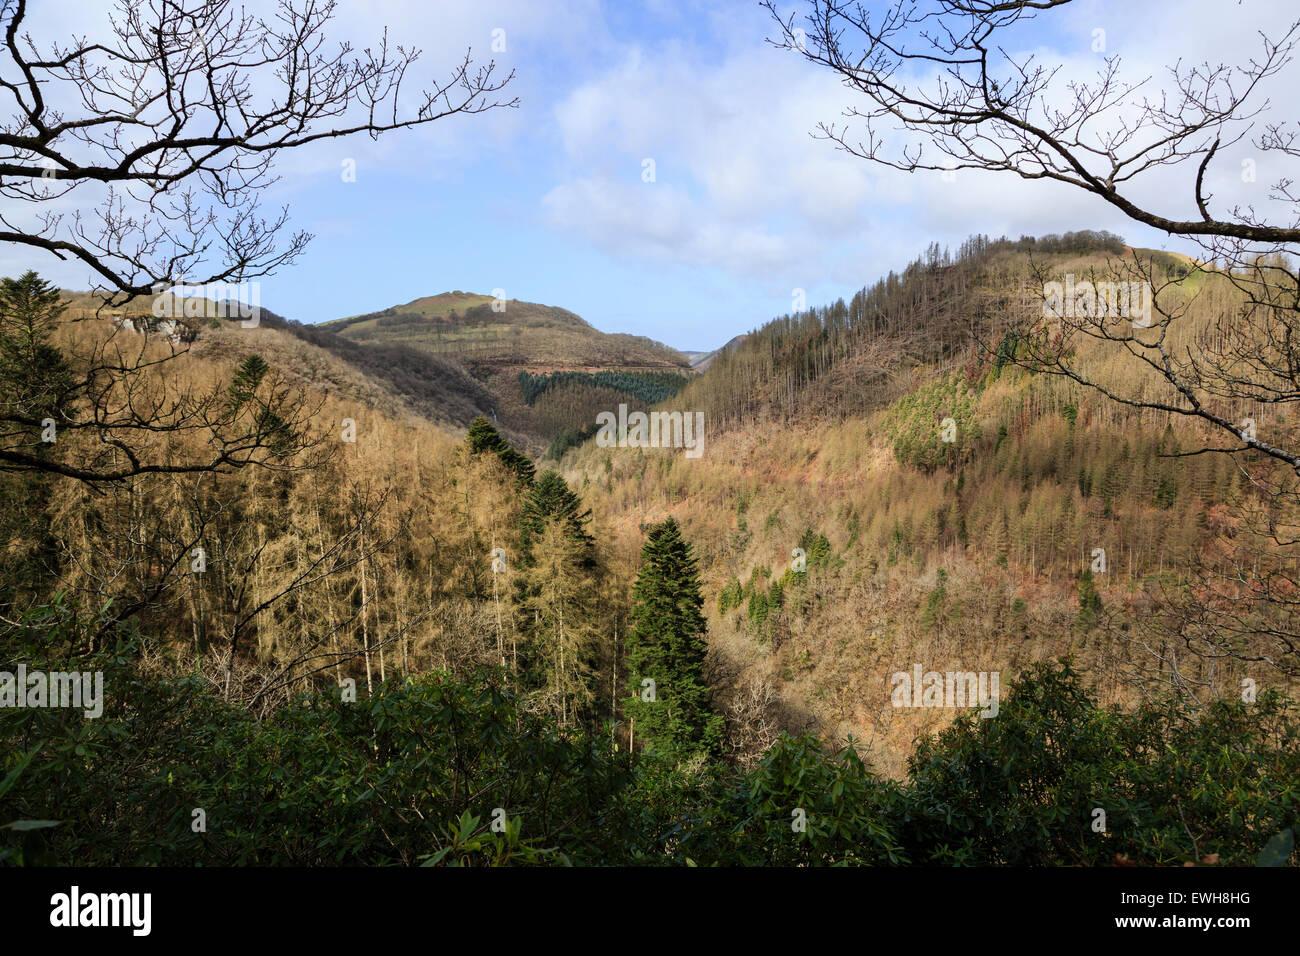 The Rheidol Valley at Devil's Bridge, Ceredigion, Wales - Stock Image